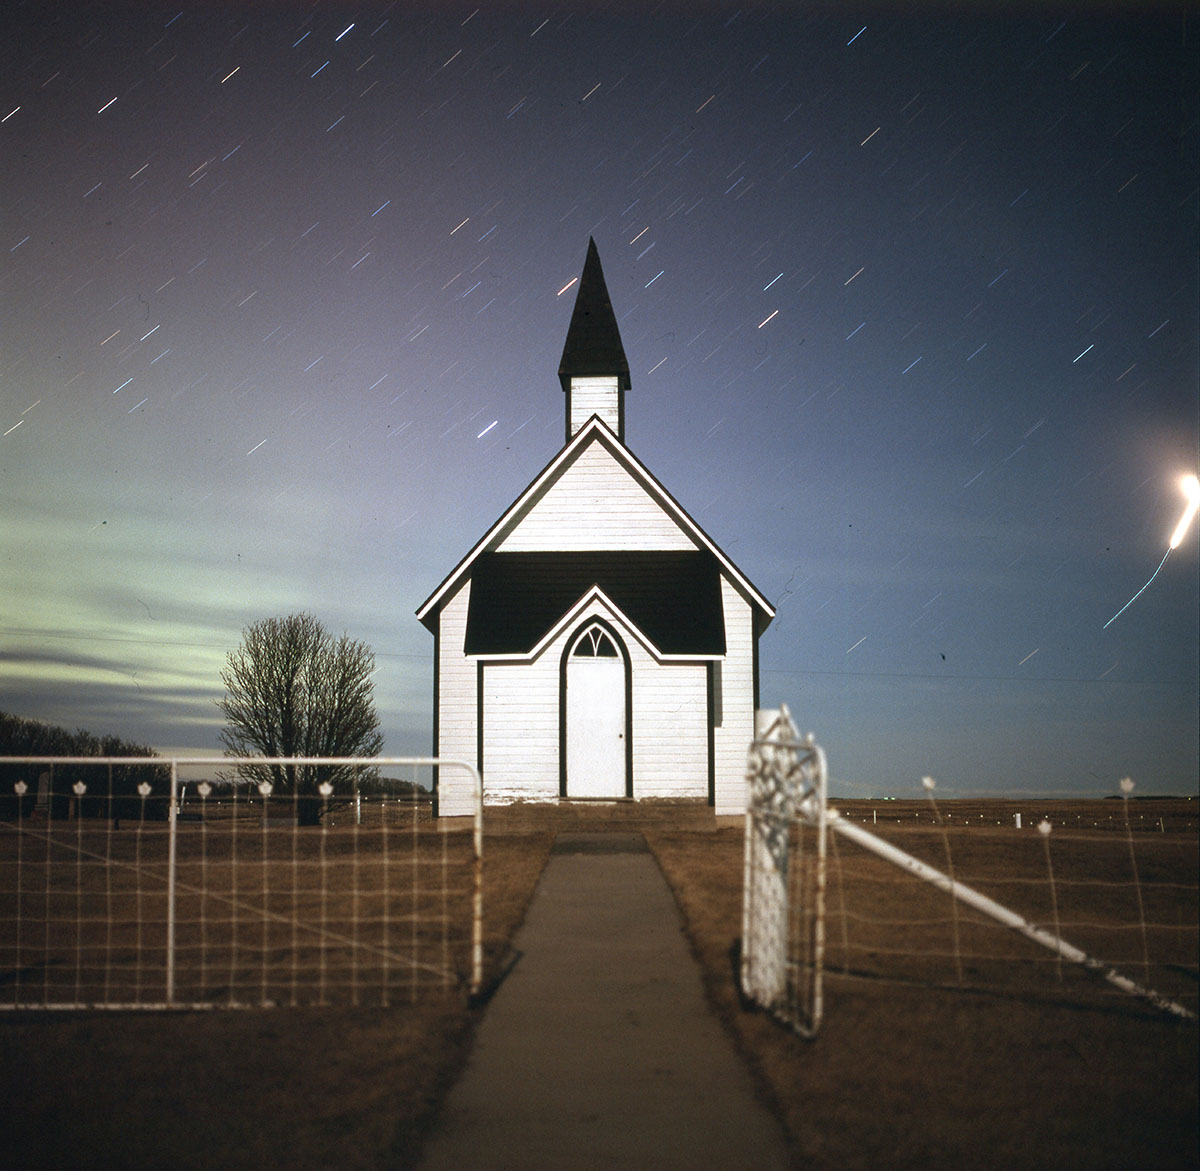 Near Zehner, Saskatchewan | Hasselblad 500CM + 80mm Zeiss Planar f/2.8  Fuji Provia 100F |80mm @ f/2.8 ISO80 150s